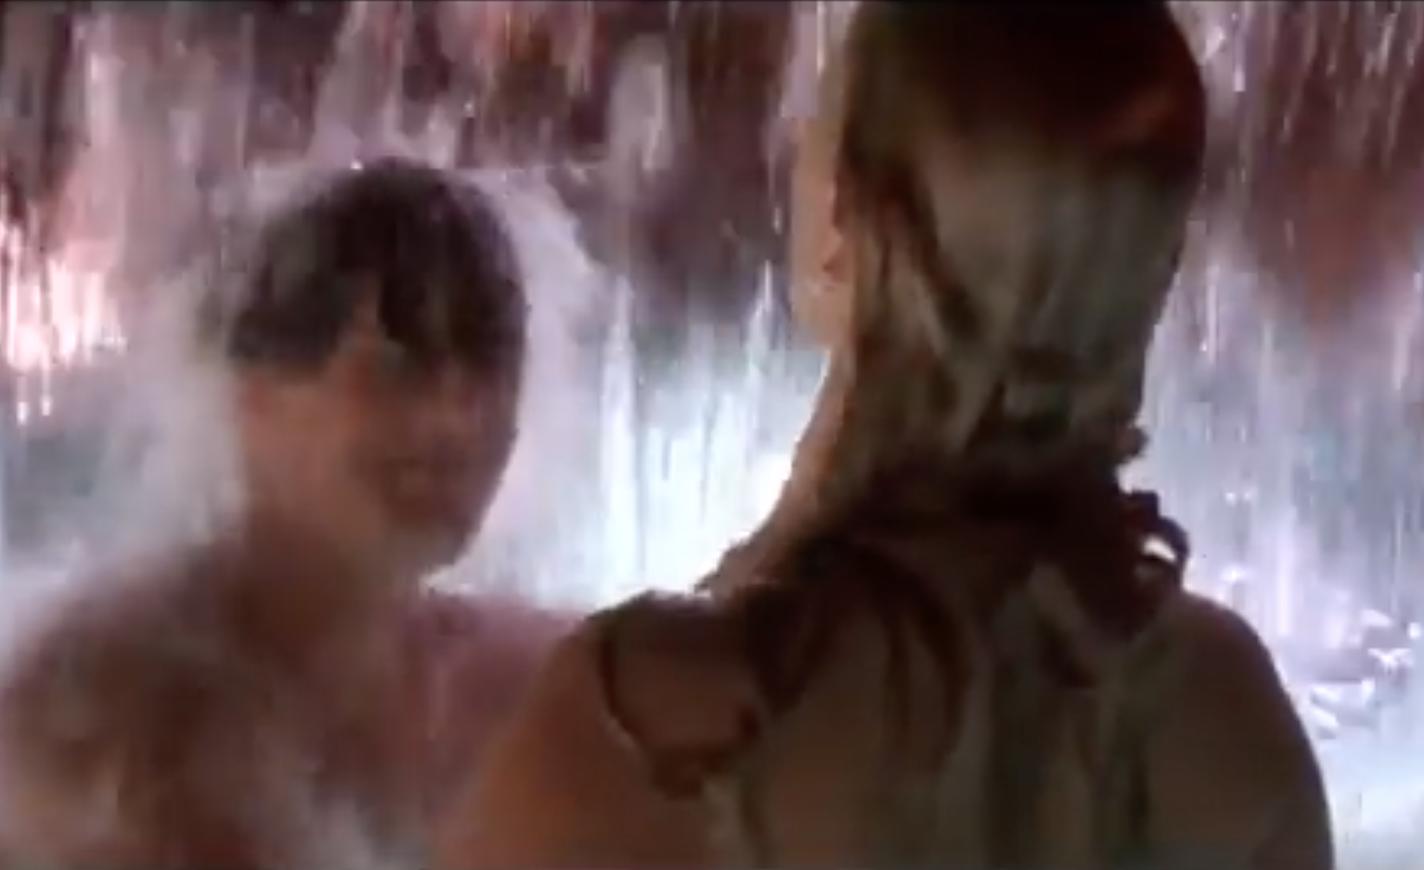 Actors Porn Born 1995 hot movie sex scenes - sex scenes from movies